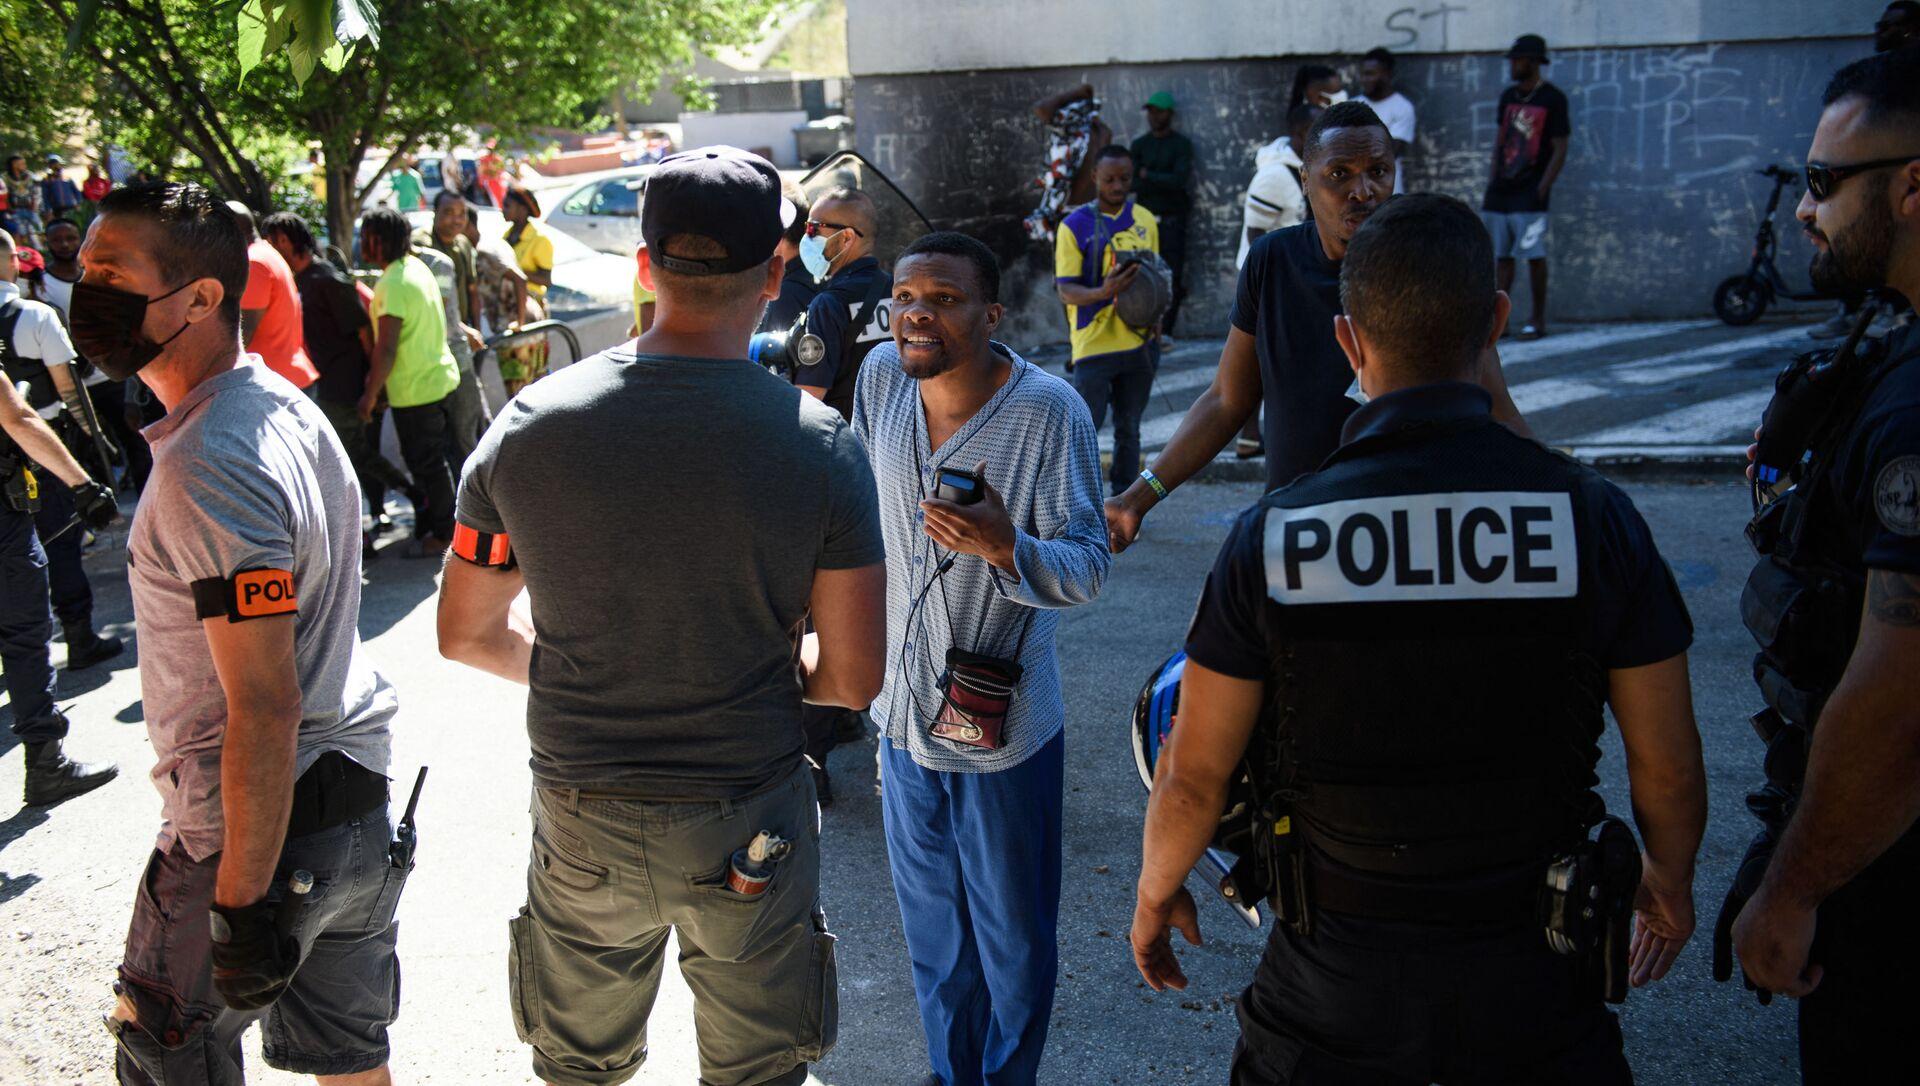 Люди разговаривают с полицейскими в Марселе, на юге Франции - Sputnik Азербайджан, 1920, 30.08.2021